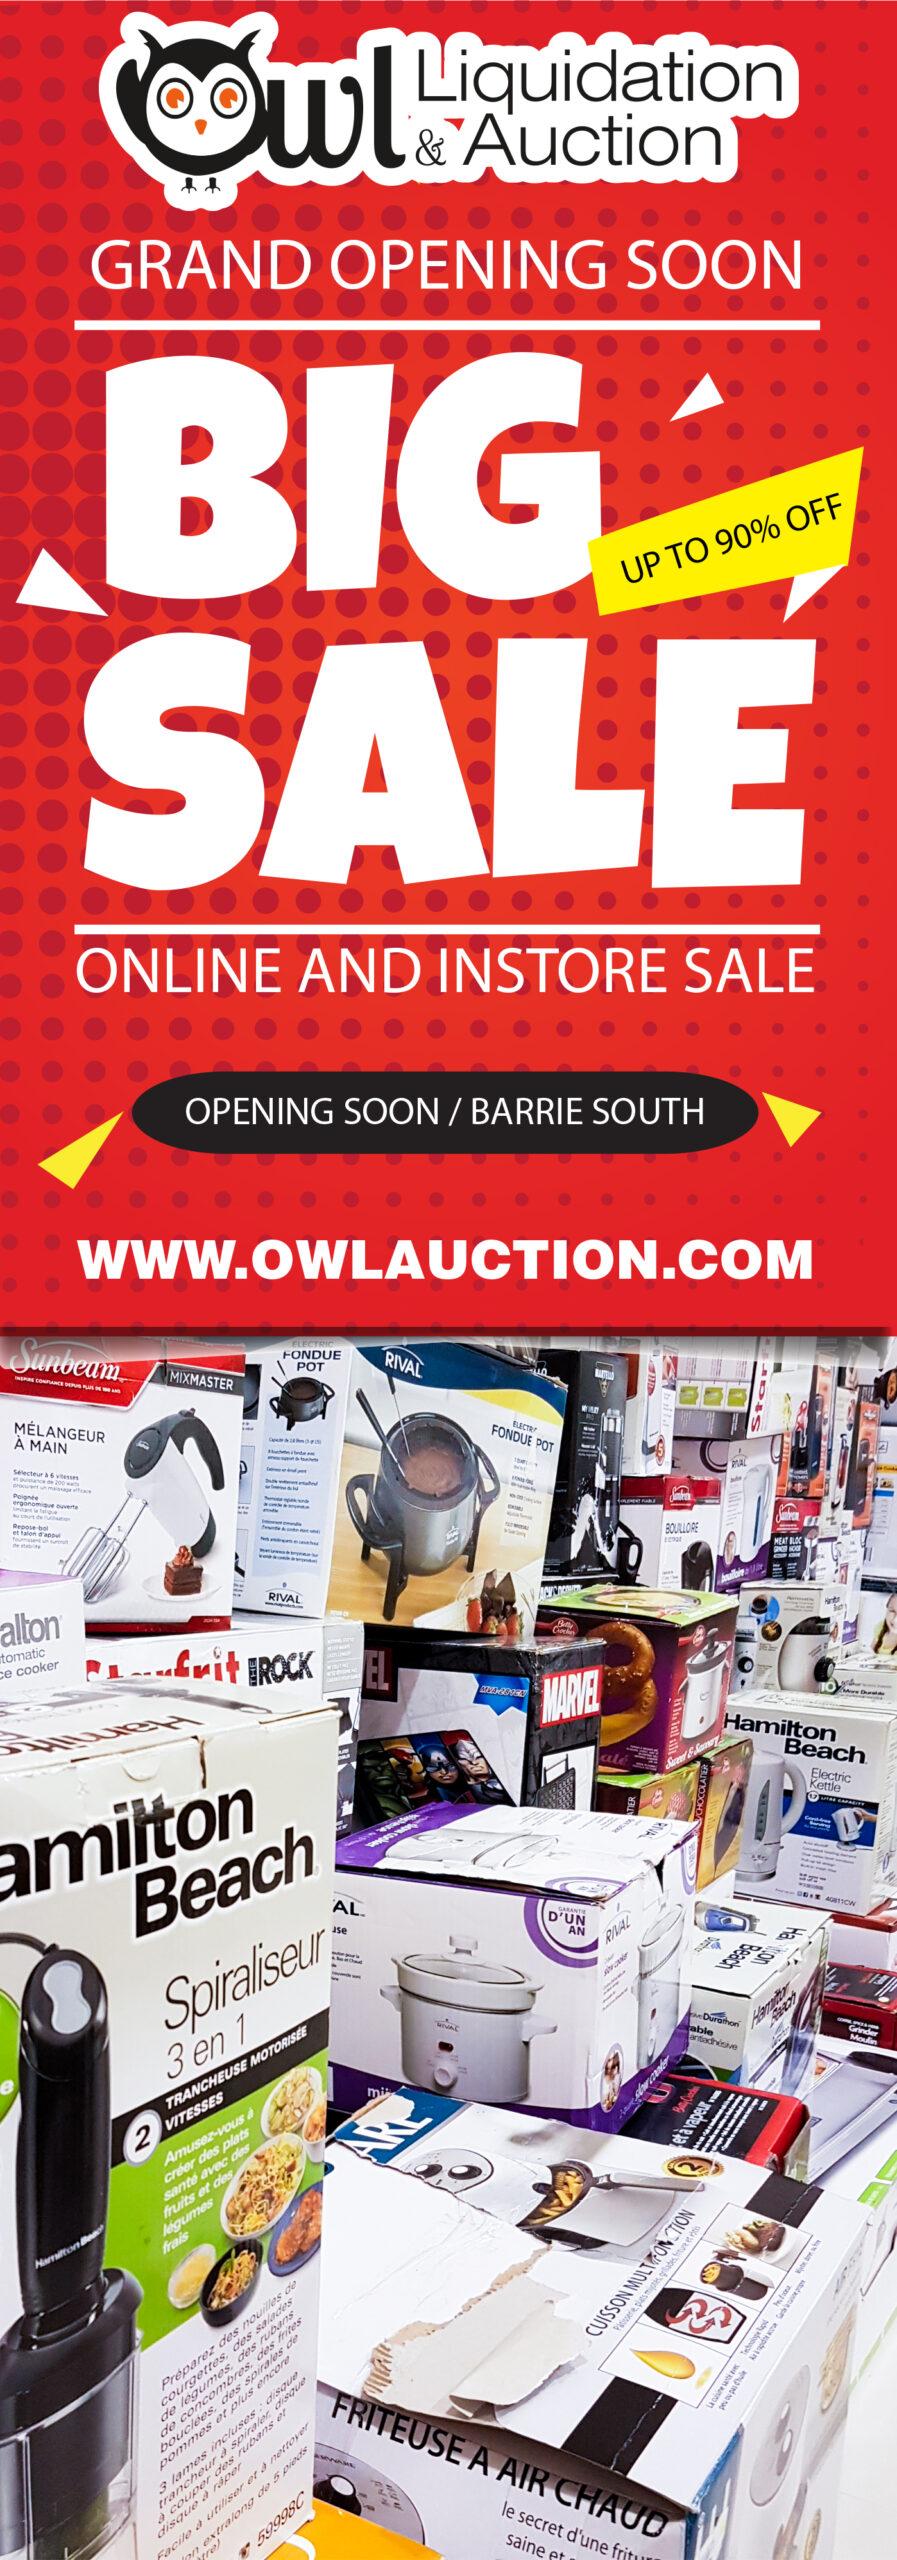 Owl Liquidation - CGArt Web Design Toronto